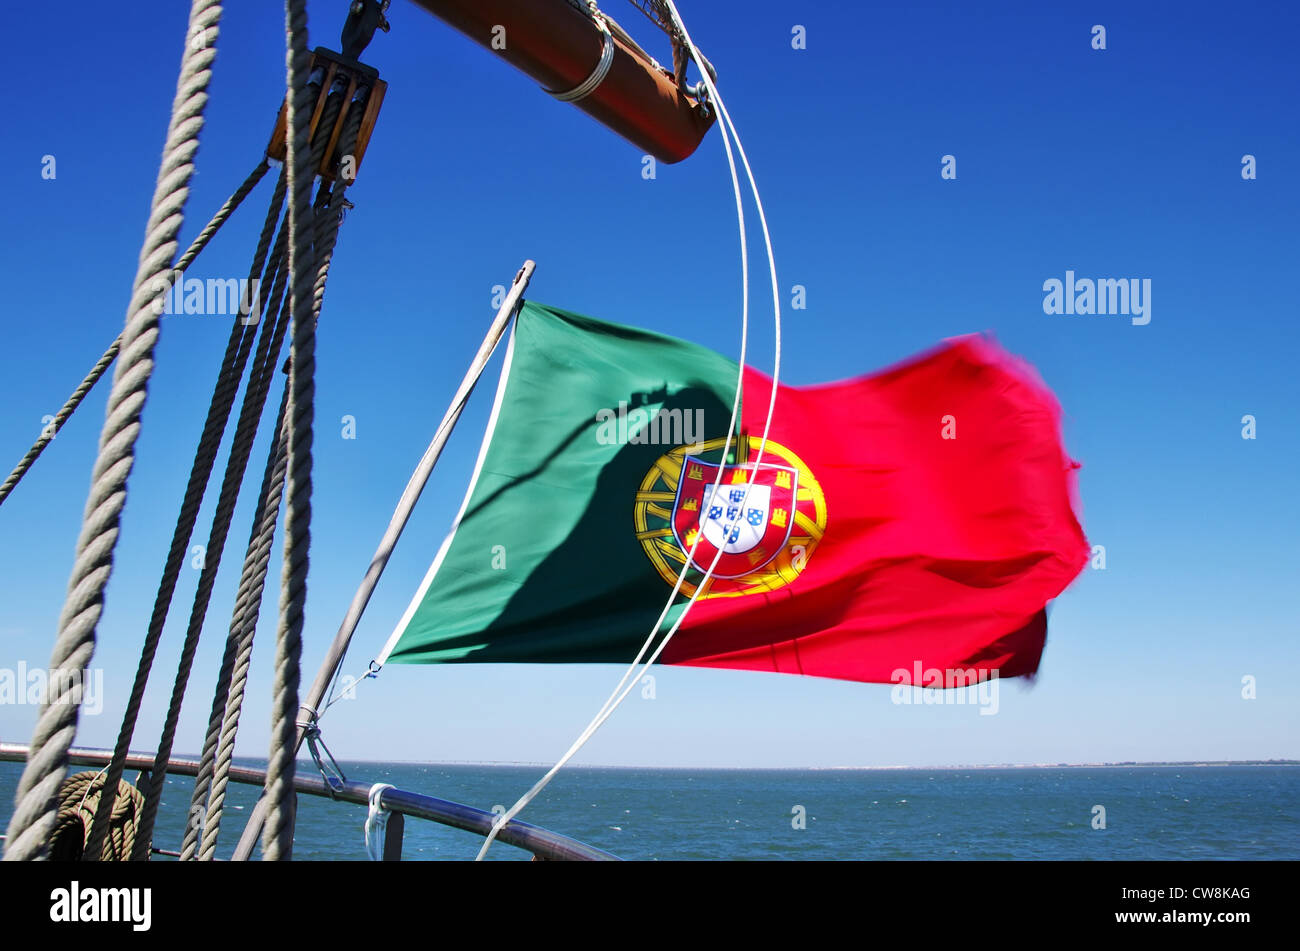 Portuguese flag on sailboat - Stock Image